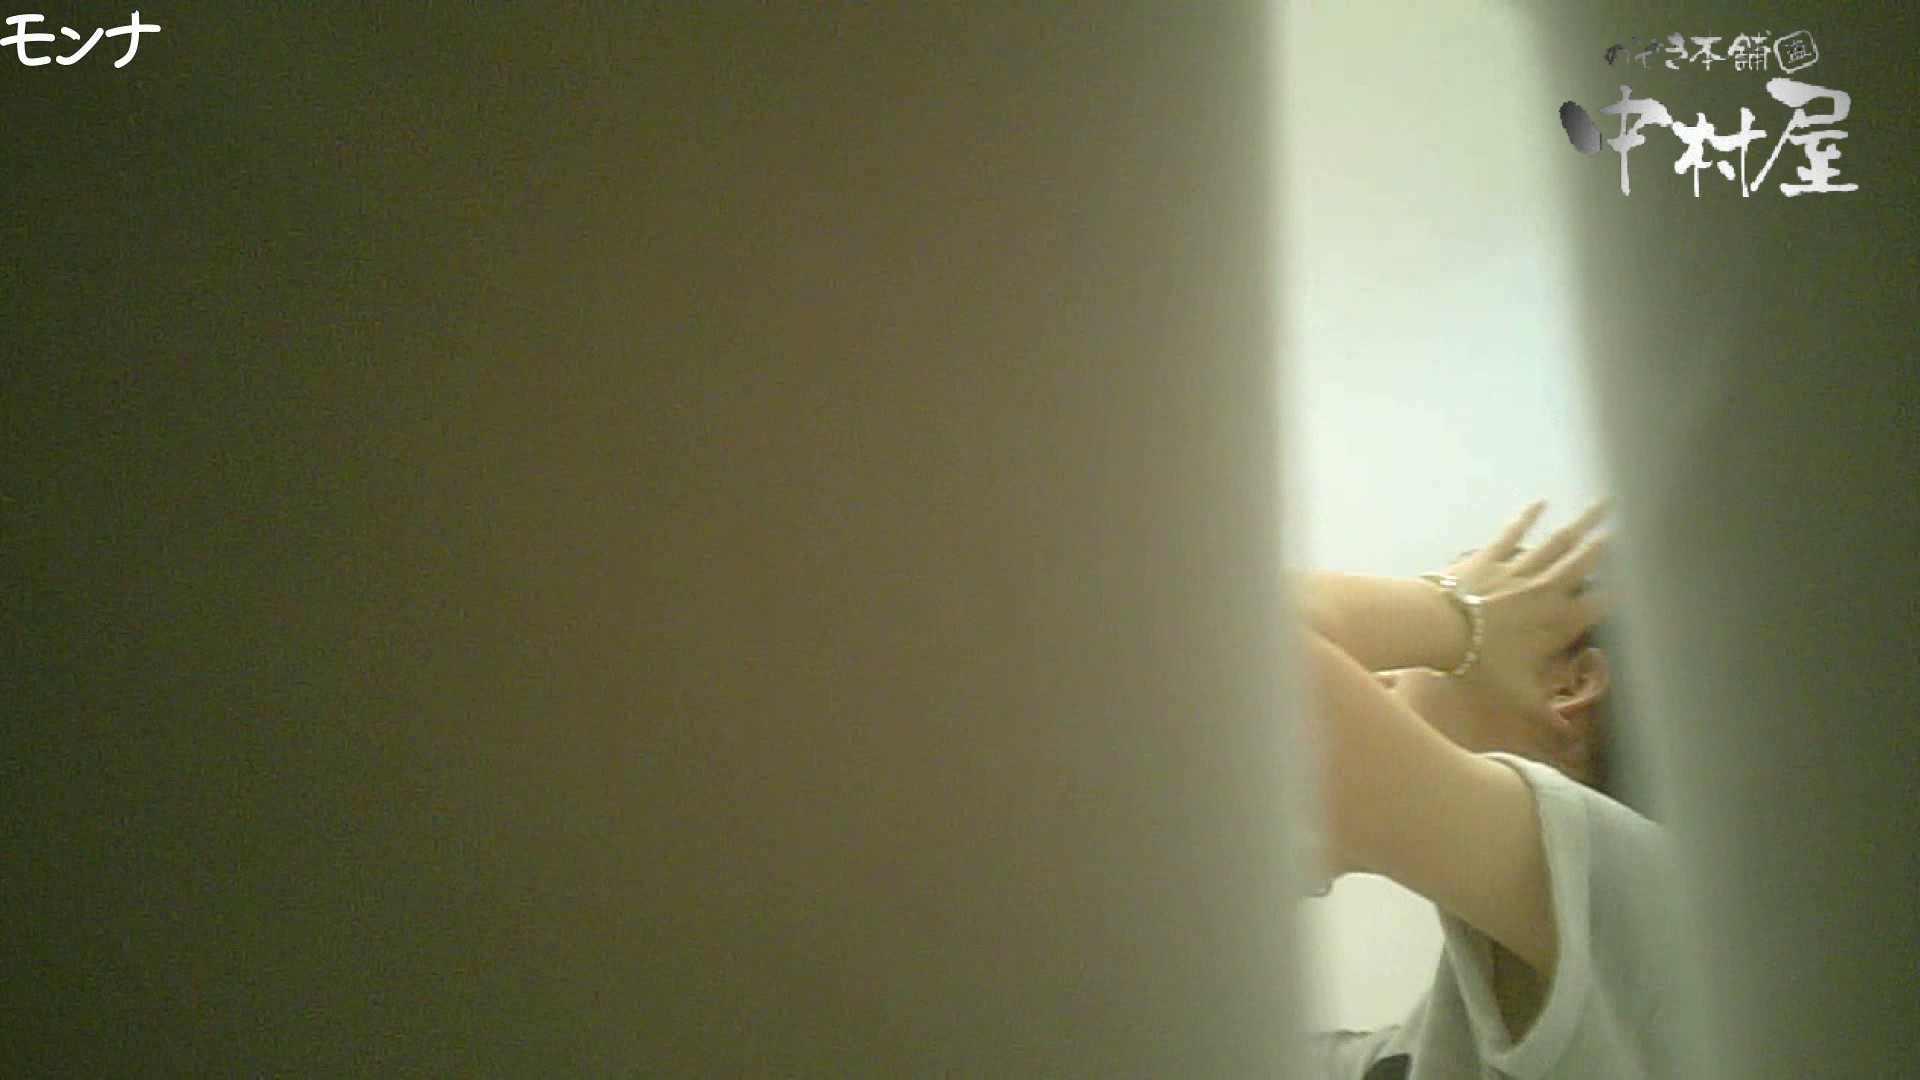 有名大学女性洗面所 vol.65 秘技!!マルチアングル天井撮り!! 洗面所編 性交動画流出 106PIX 28